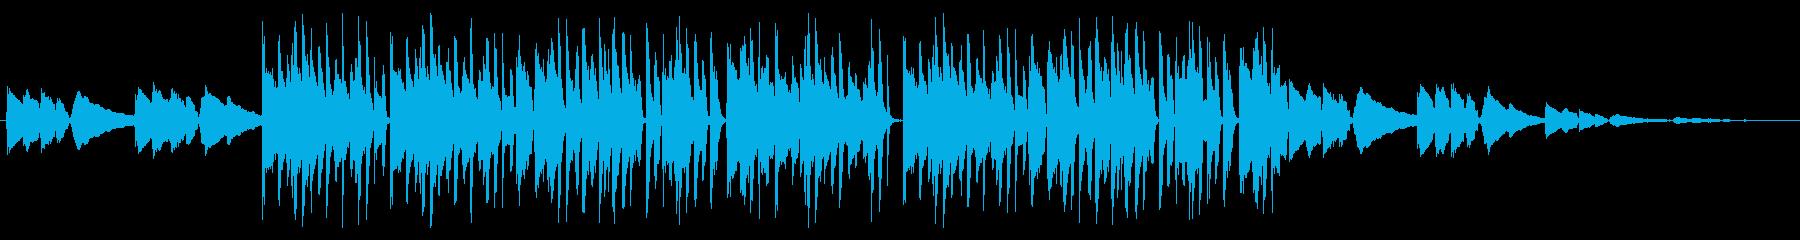 Lofi Hiphop/おしゃれVLOGの再生済みの波形